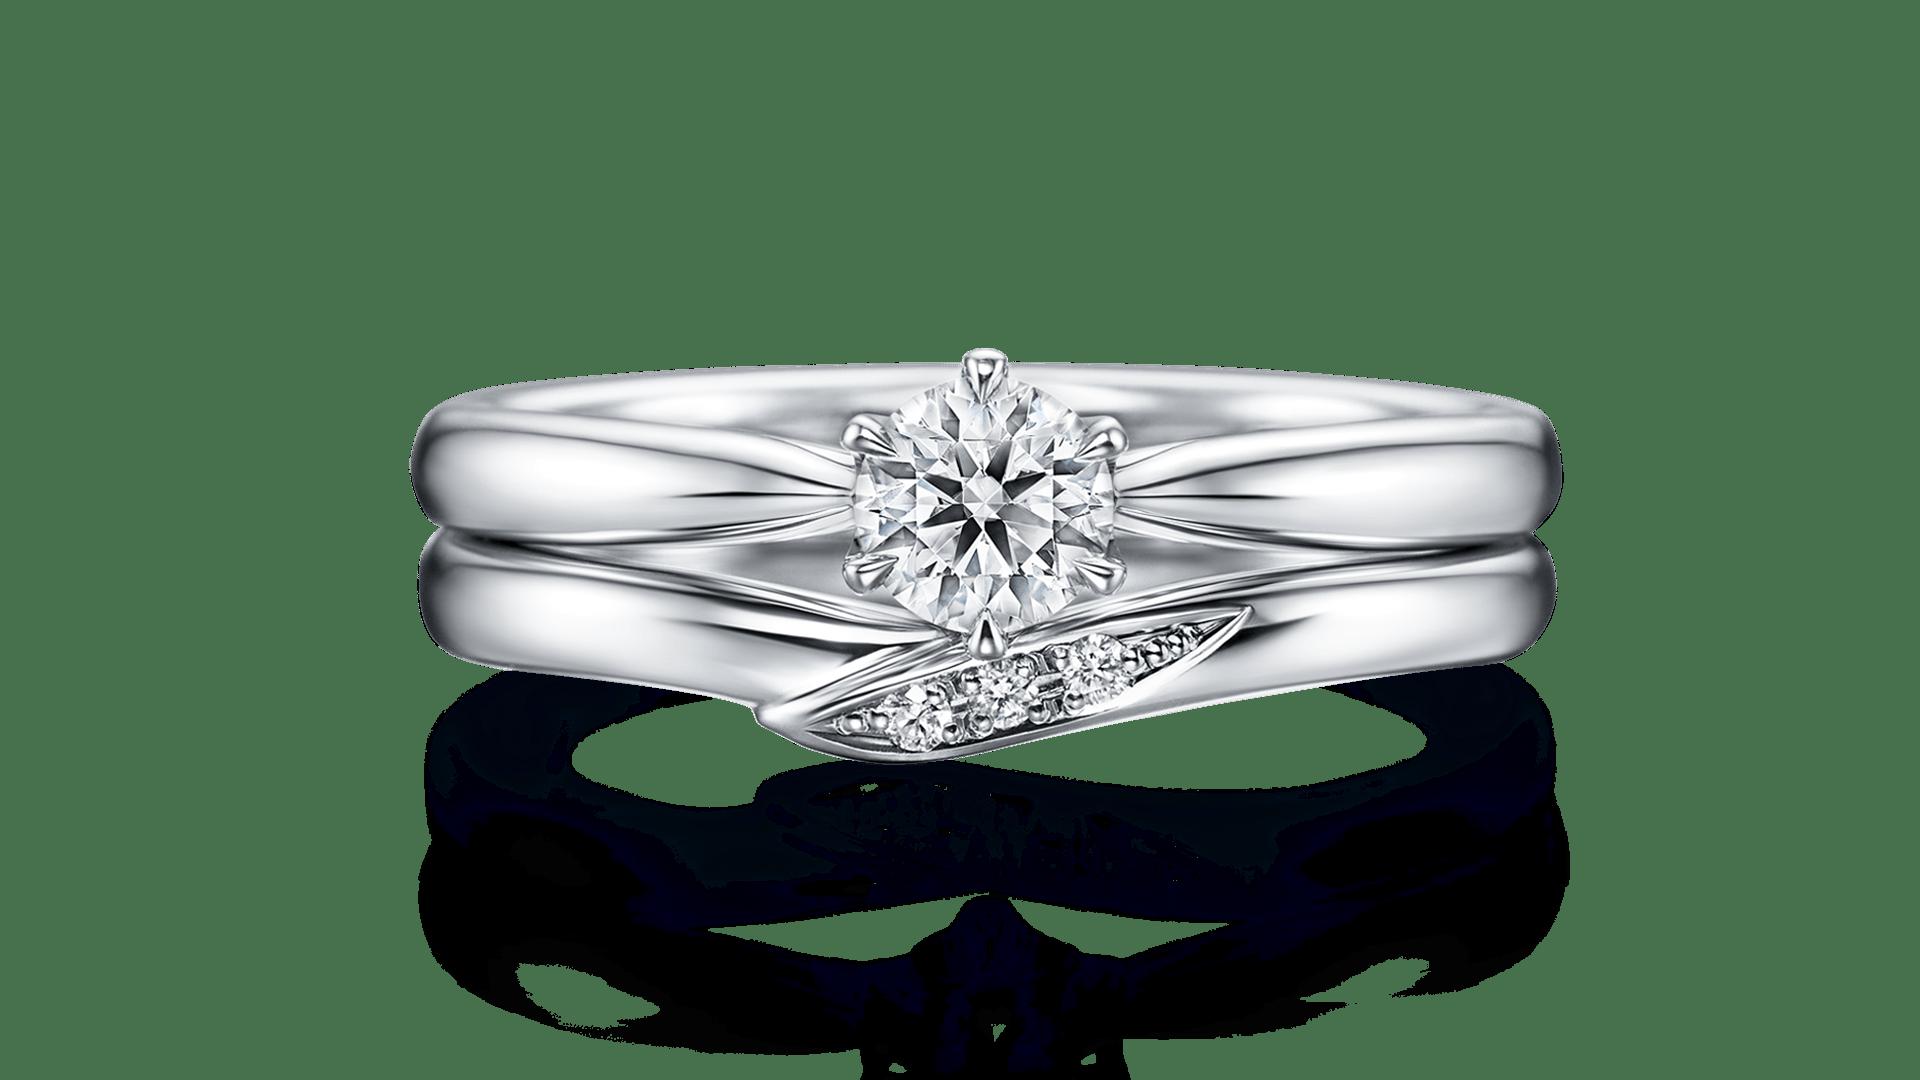 altair&clementia アルティア&クレメンティア | セットリングサムネイル 1